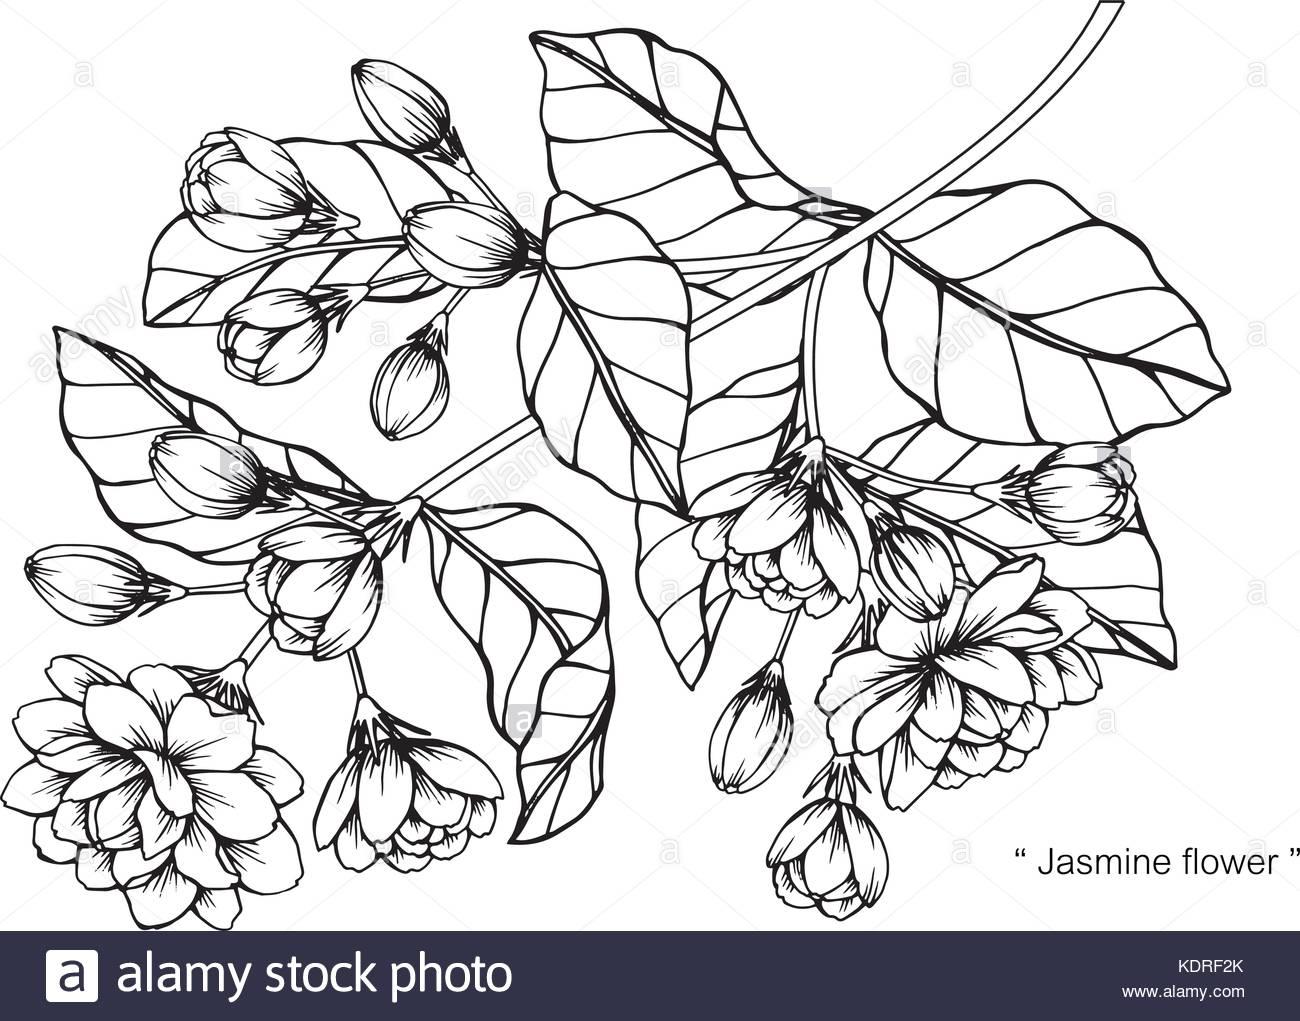 Sampaguita Flower Drawing At Getdrawings Free For Personal Use